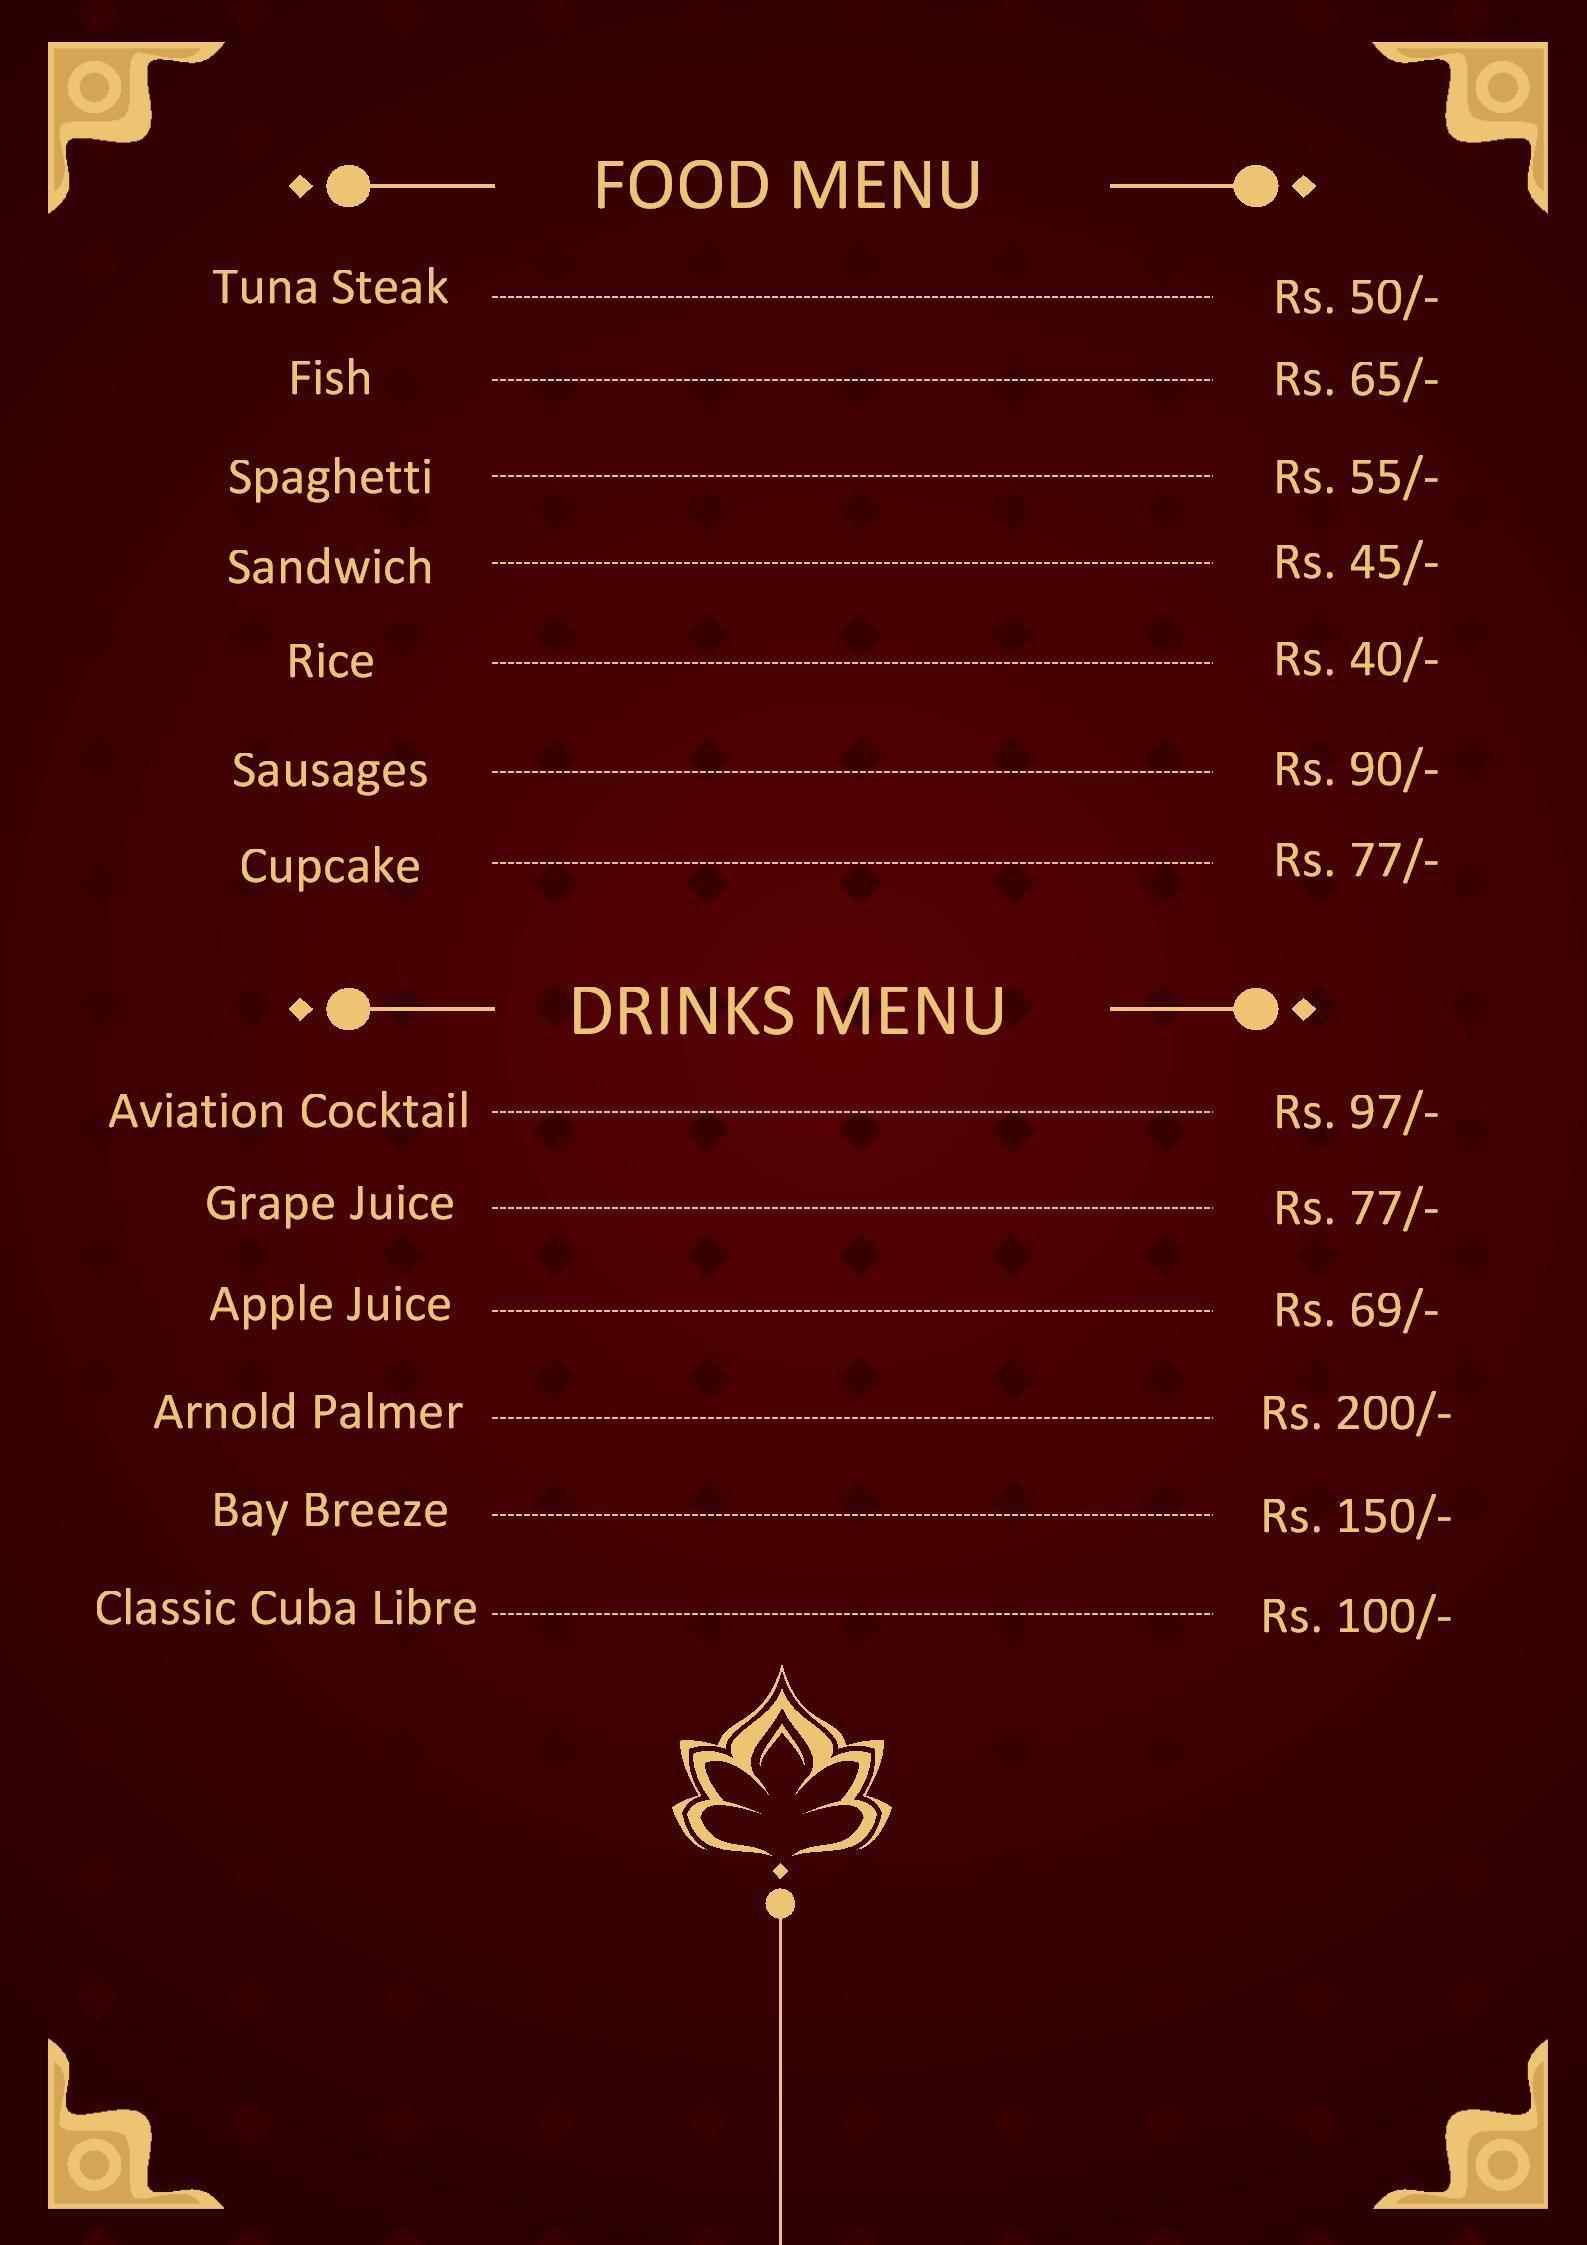 003 Impressive Menu Card Template Free Download Example  Indian Restaurant Design CafeFull